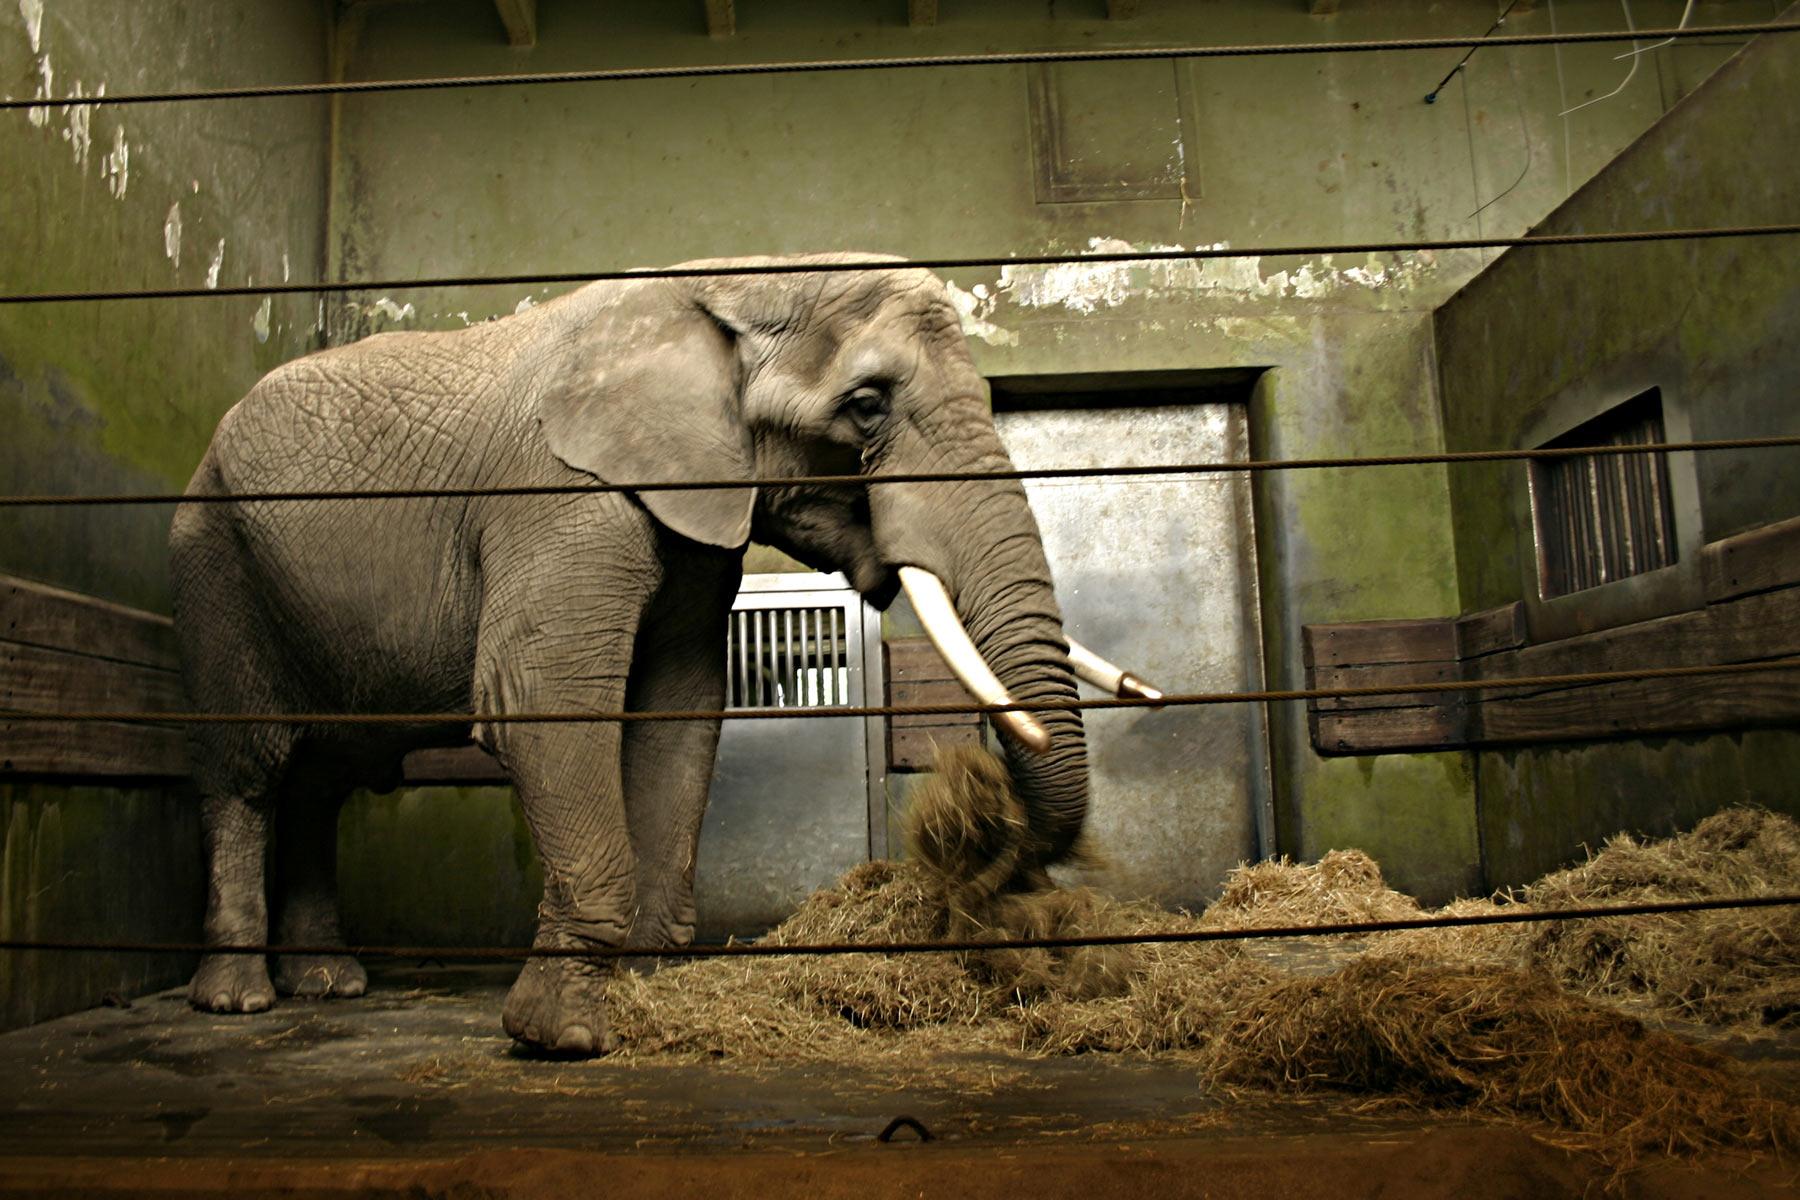 stockvault-elephant-in-cage97313.jpg